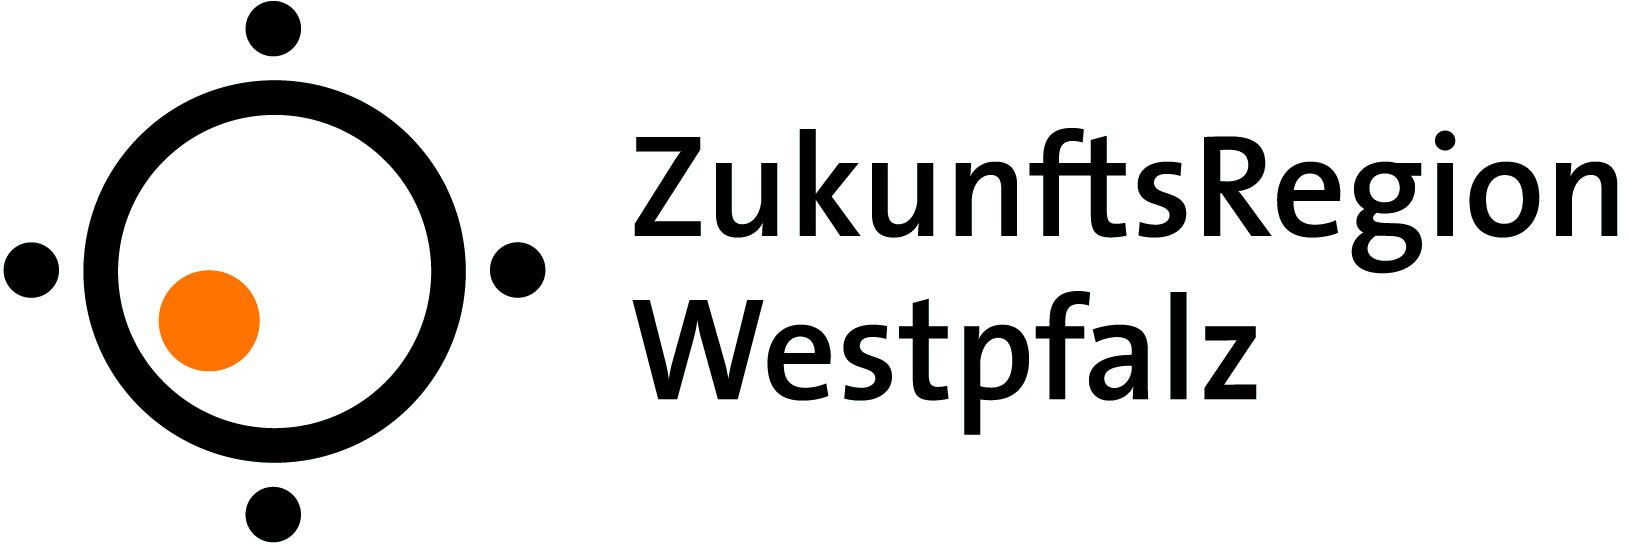 zrw-logo-b-cmyk.jpg